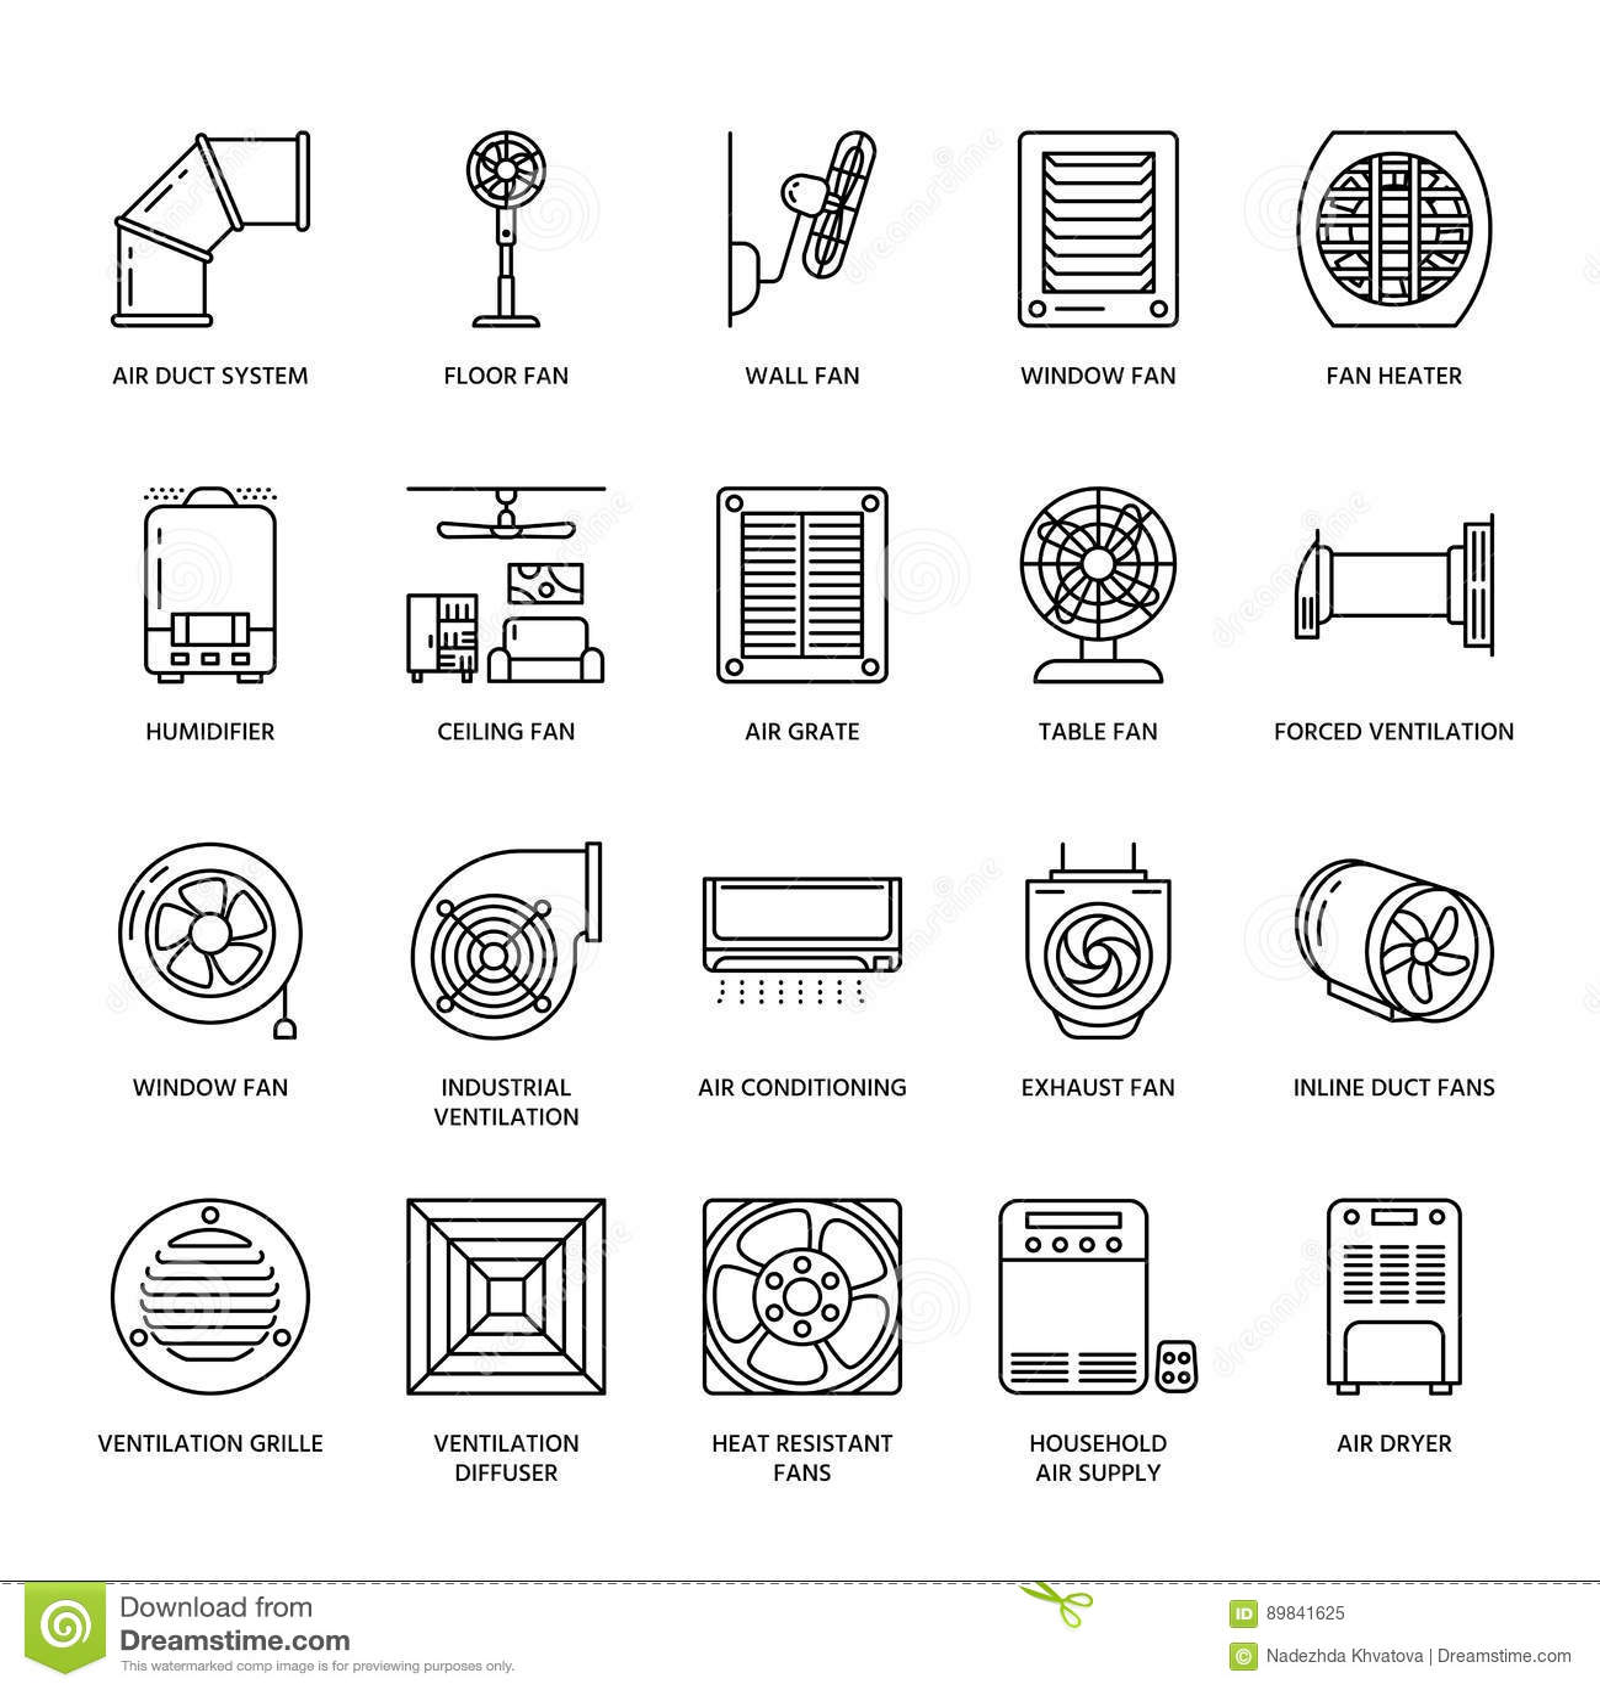 Fan Cartoons Illustrations Amp Vector Stock Images